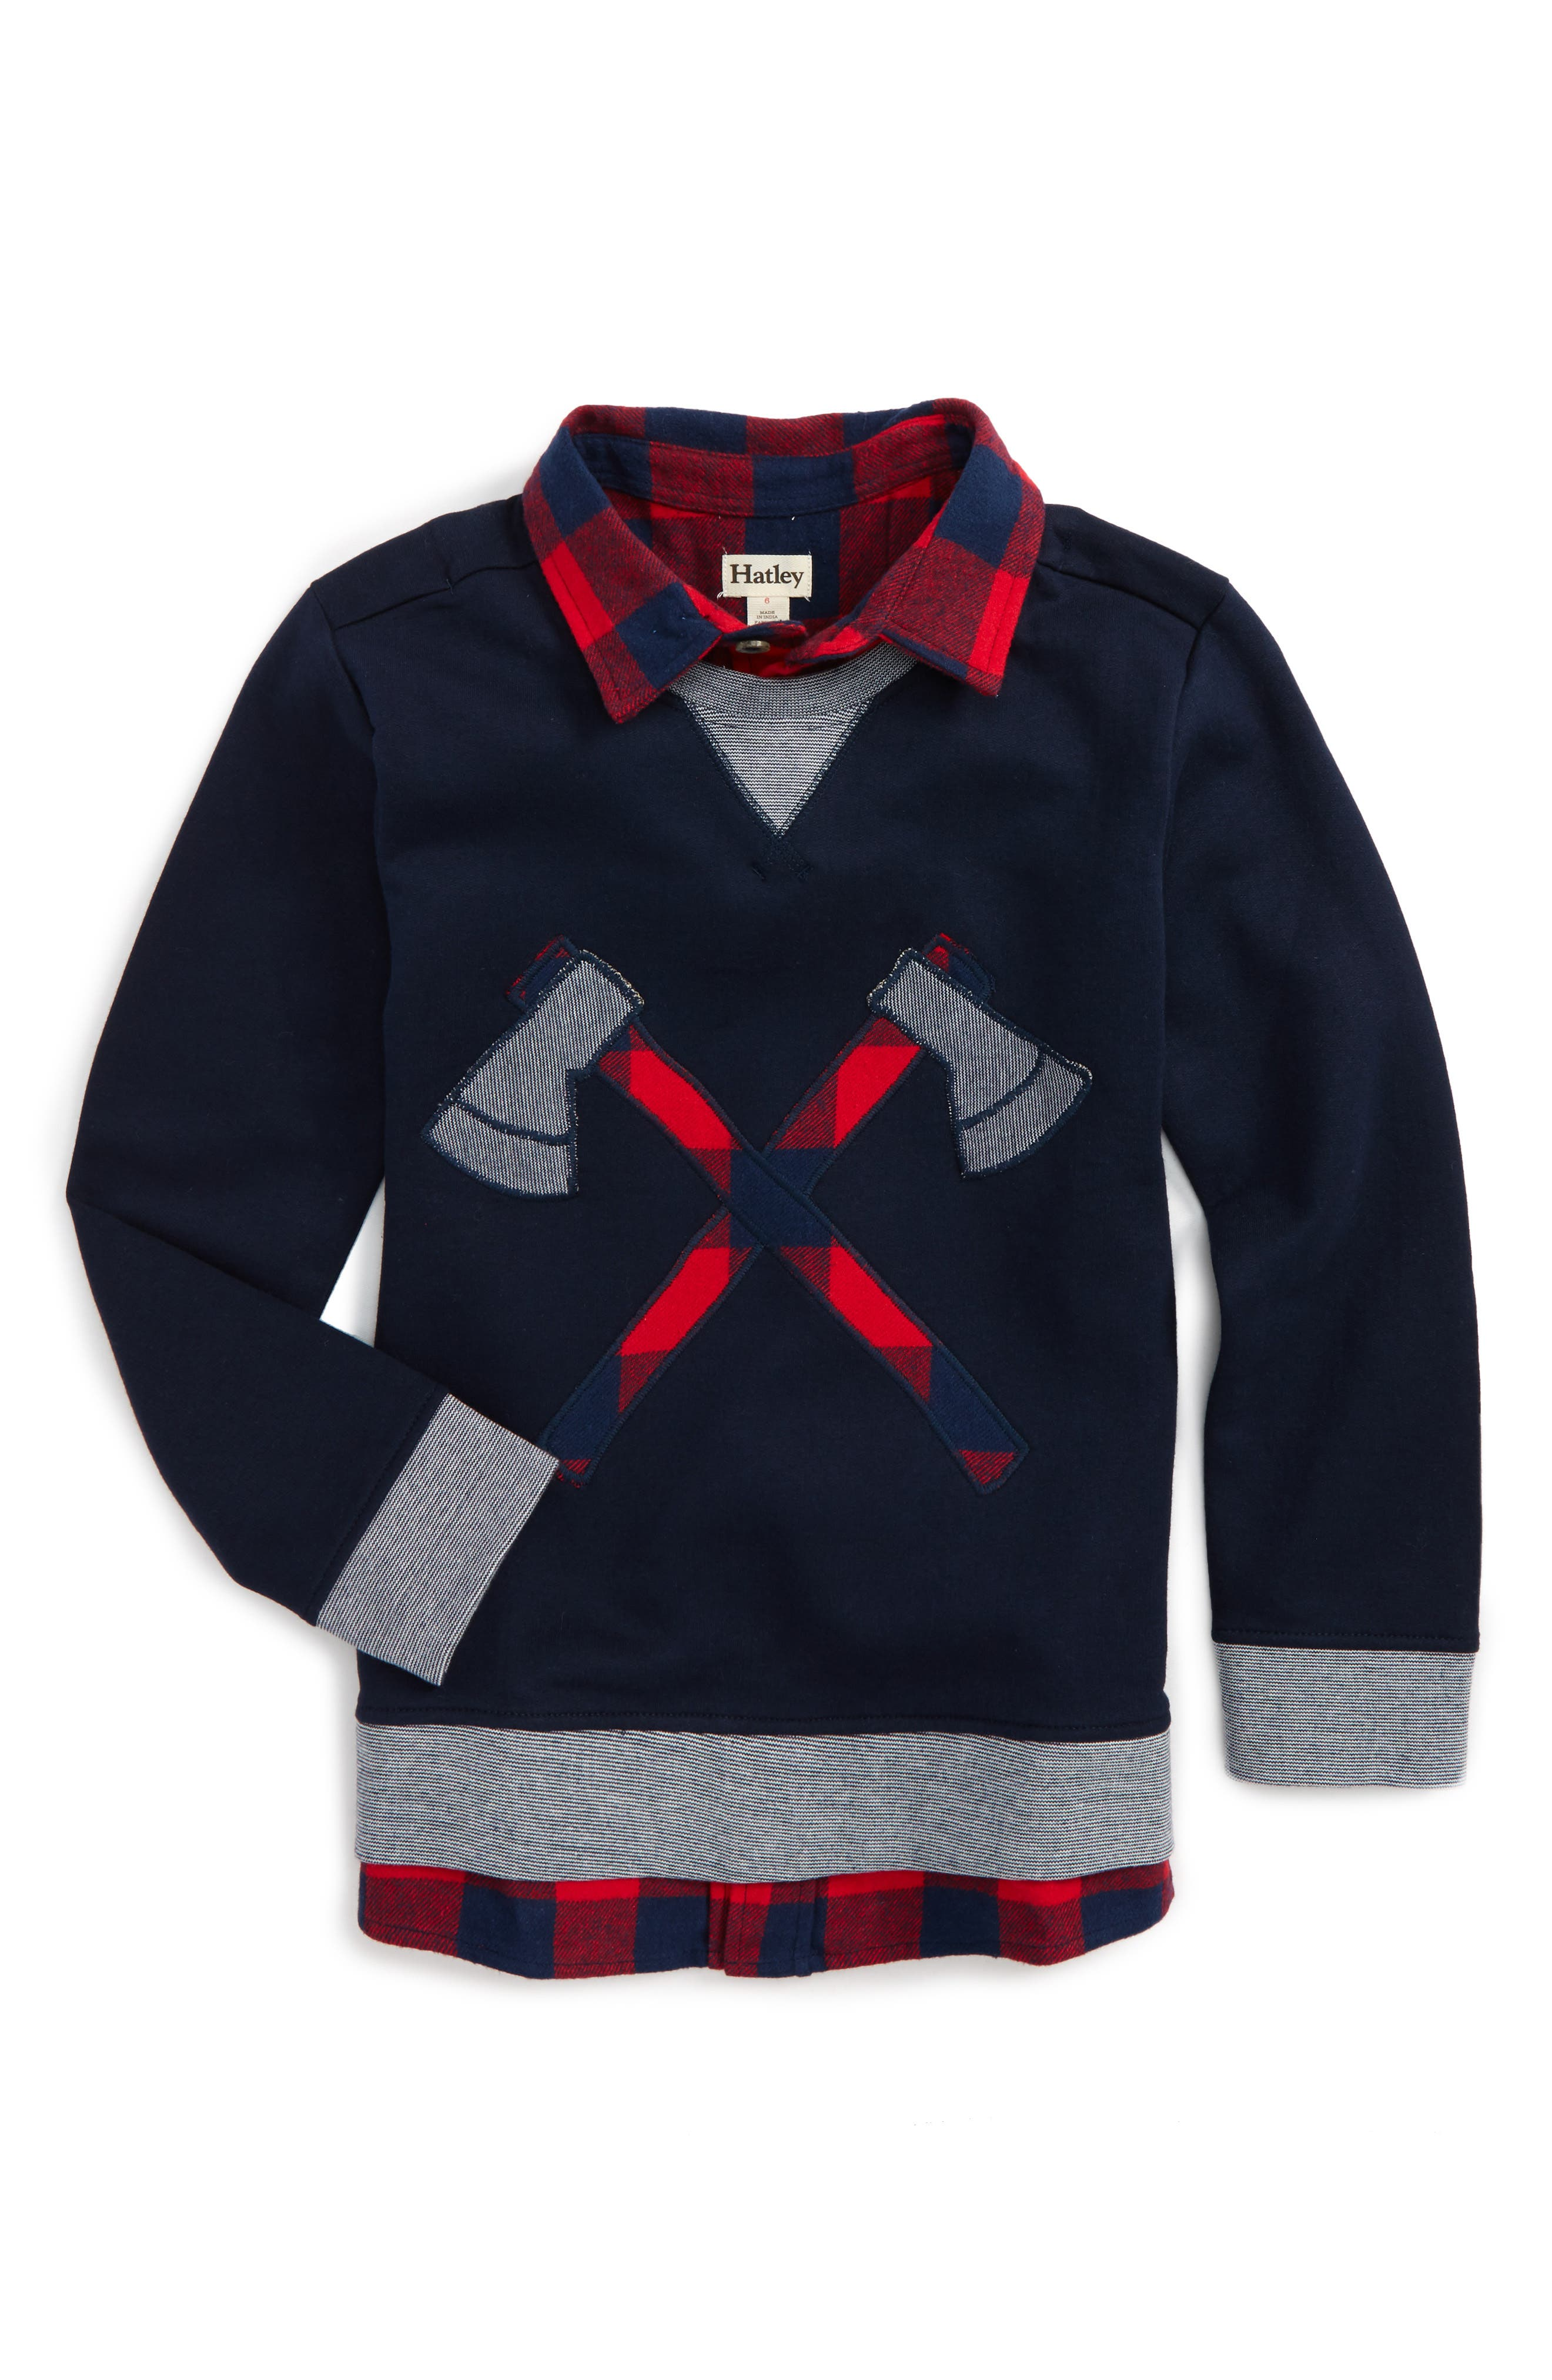 Fooler Sweater,                             Main thumbnail 1, color,                             400